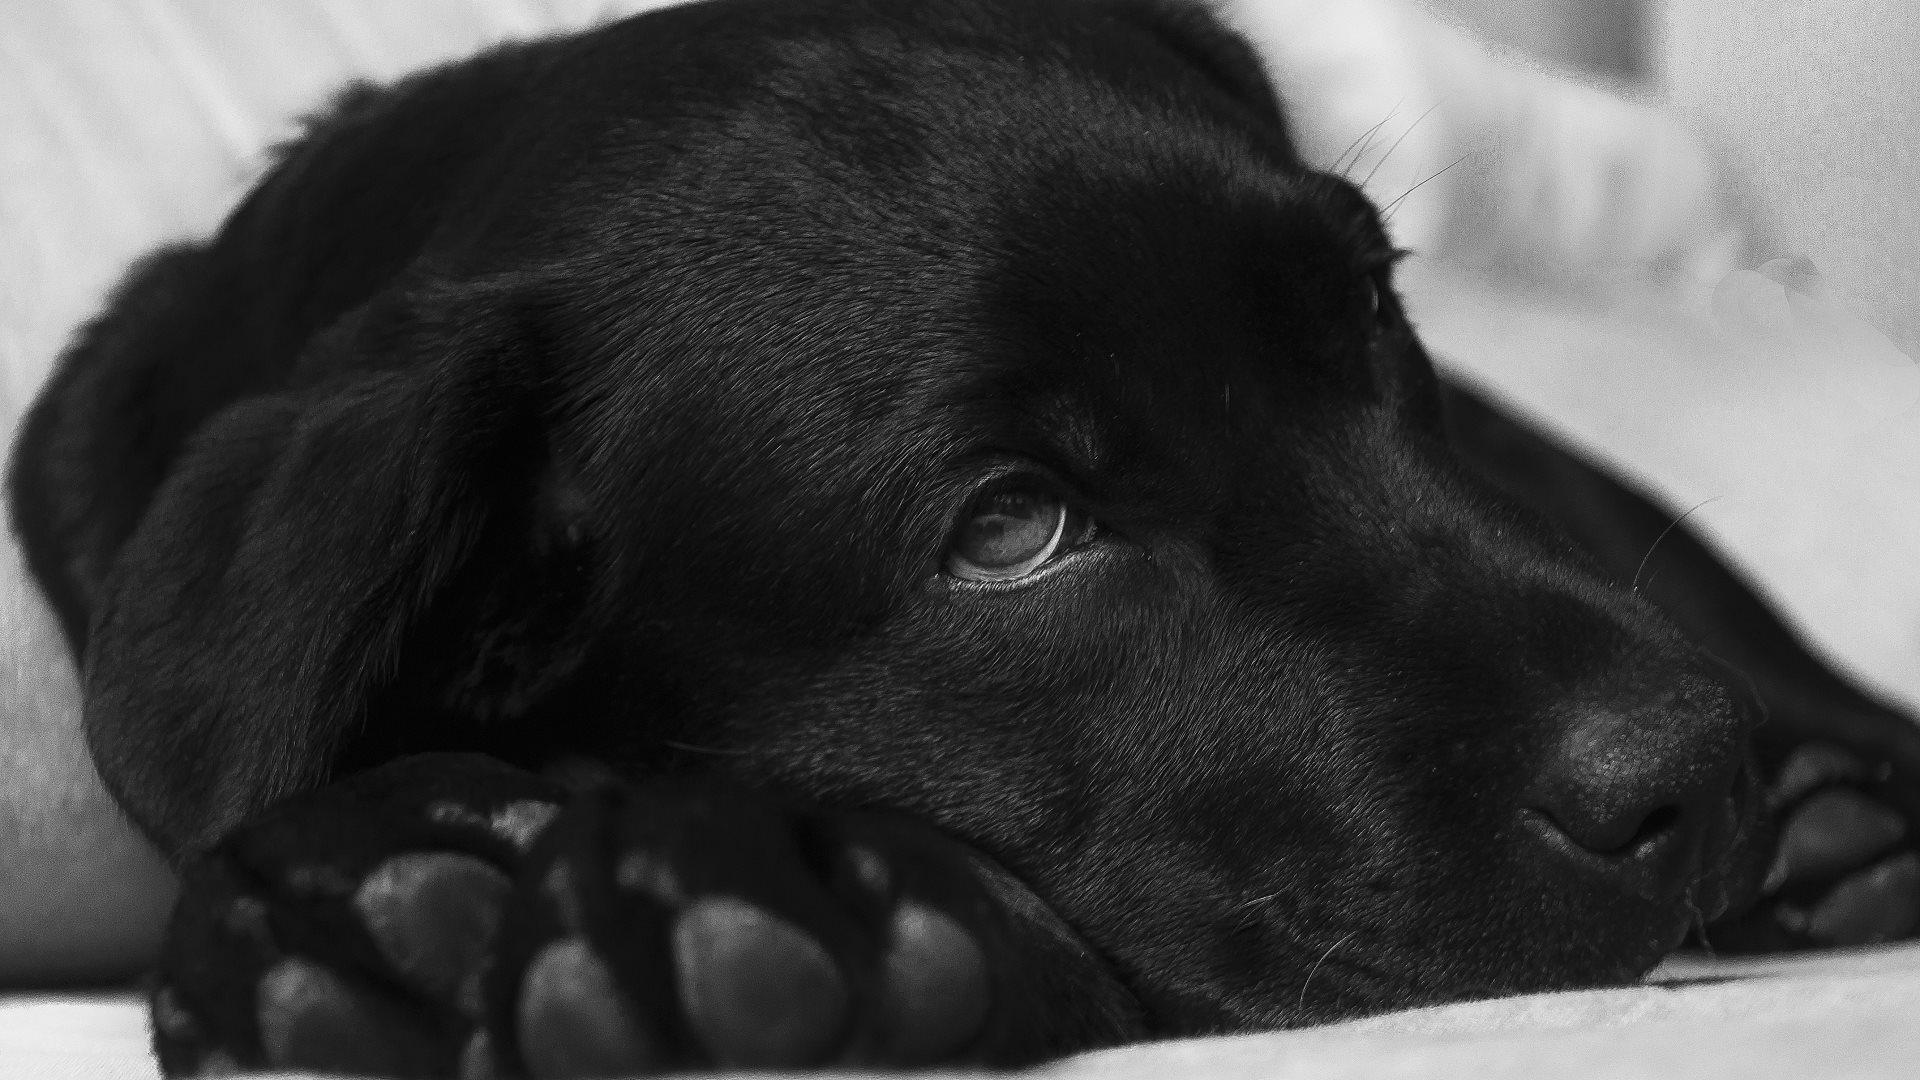 Dog-Loving Genius Creates Movie Scenes With A Beagle